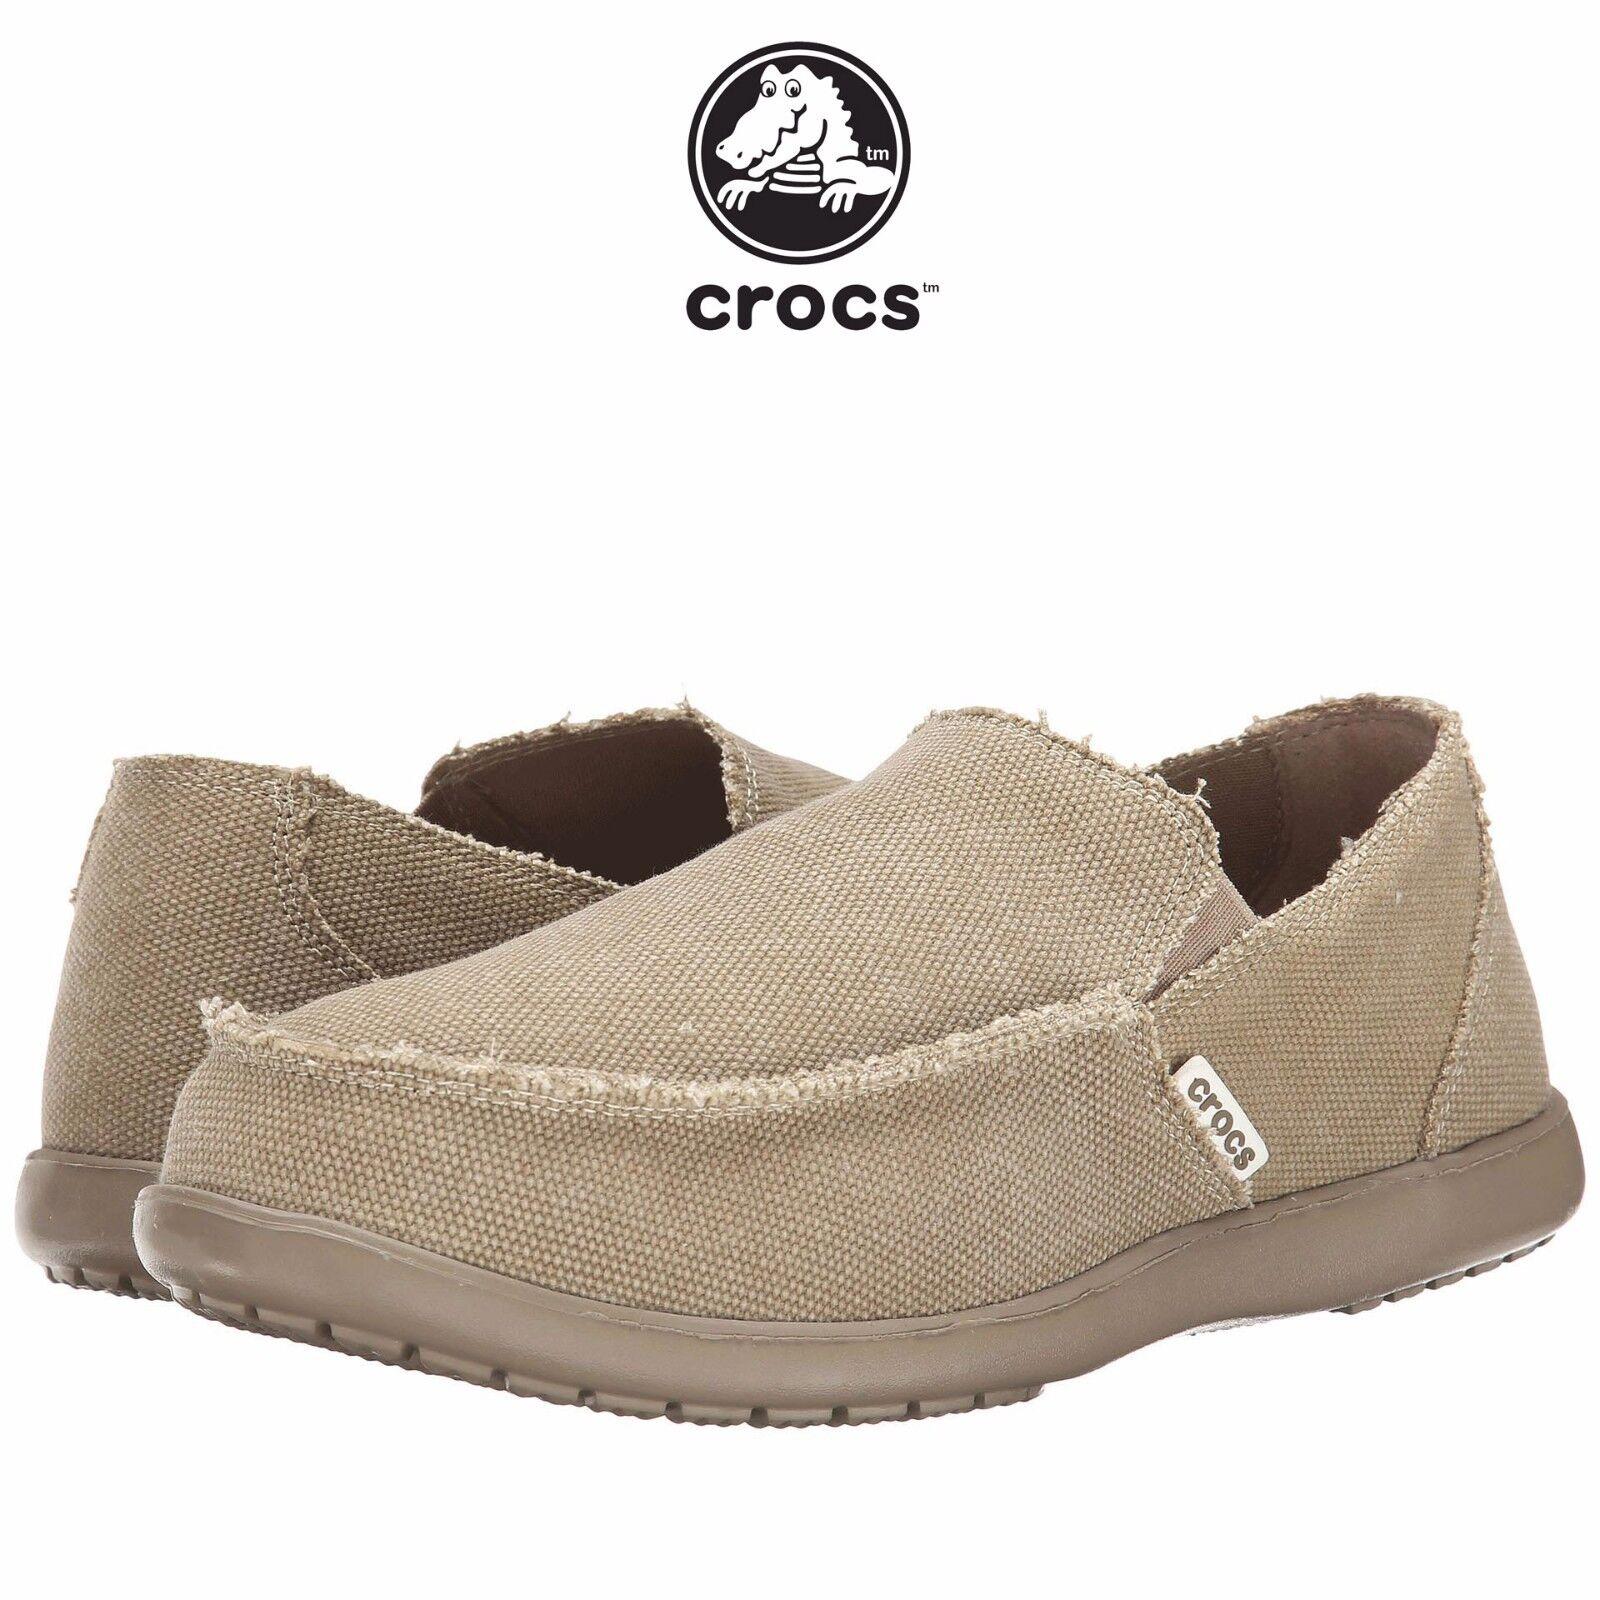 Mens Crocs Santa Cruz Fashion Loafer Khaki Canvas Casual Beach All SZs NIB